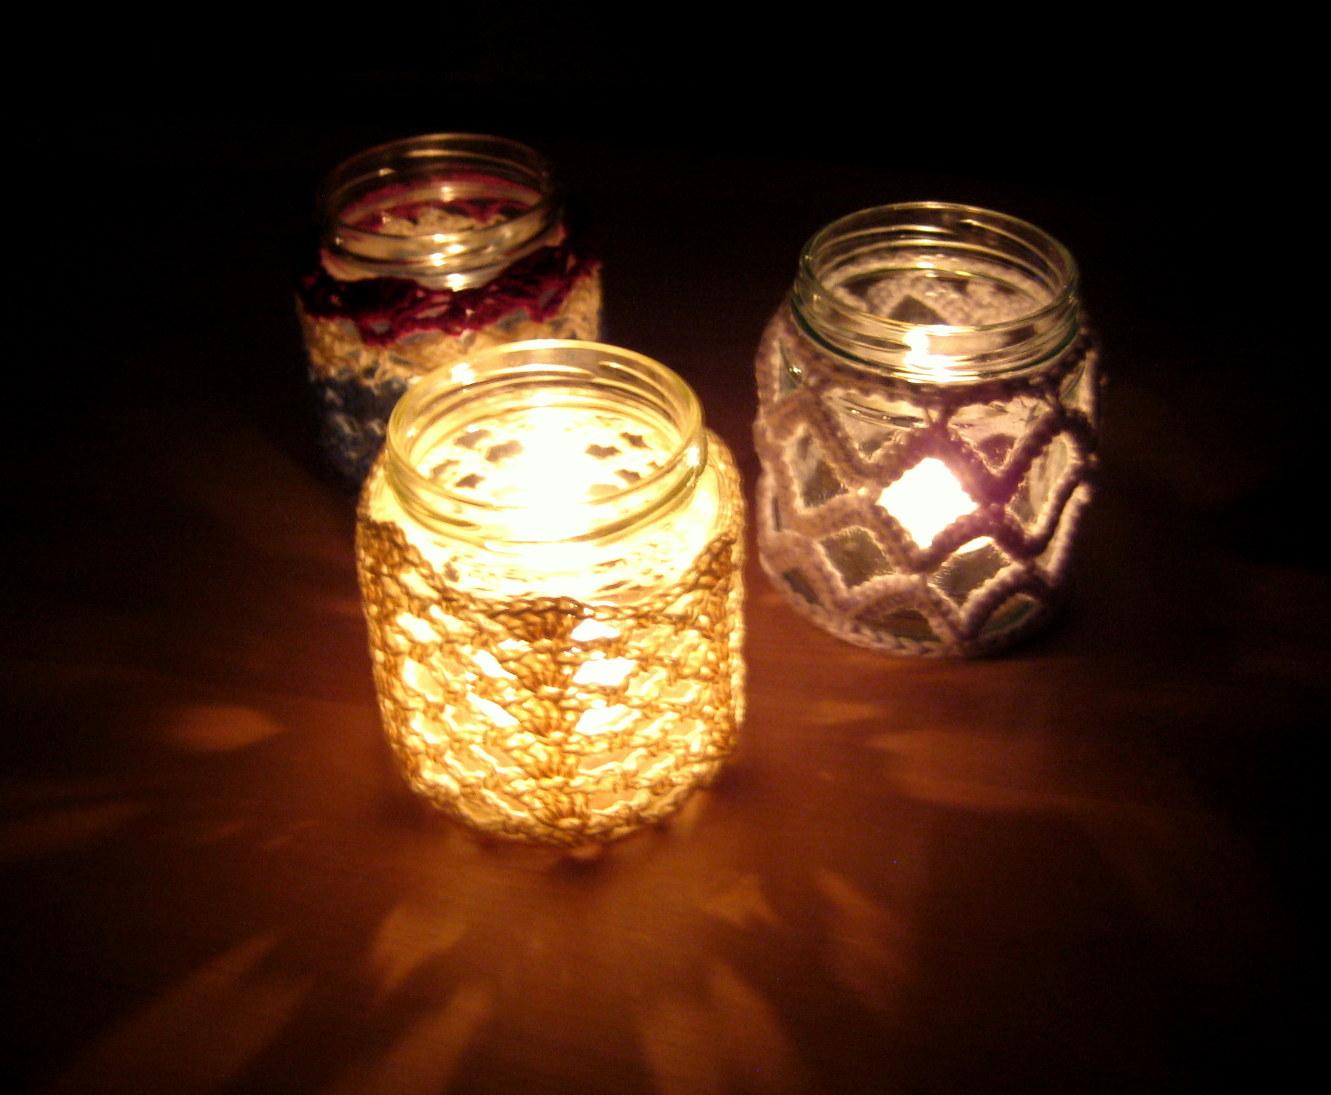 Crochet Jar Cover IIILattice Effect Make My Day Creative